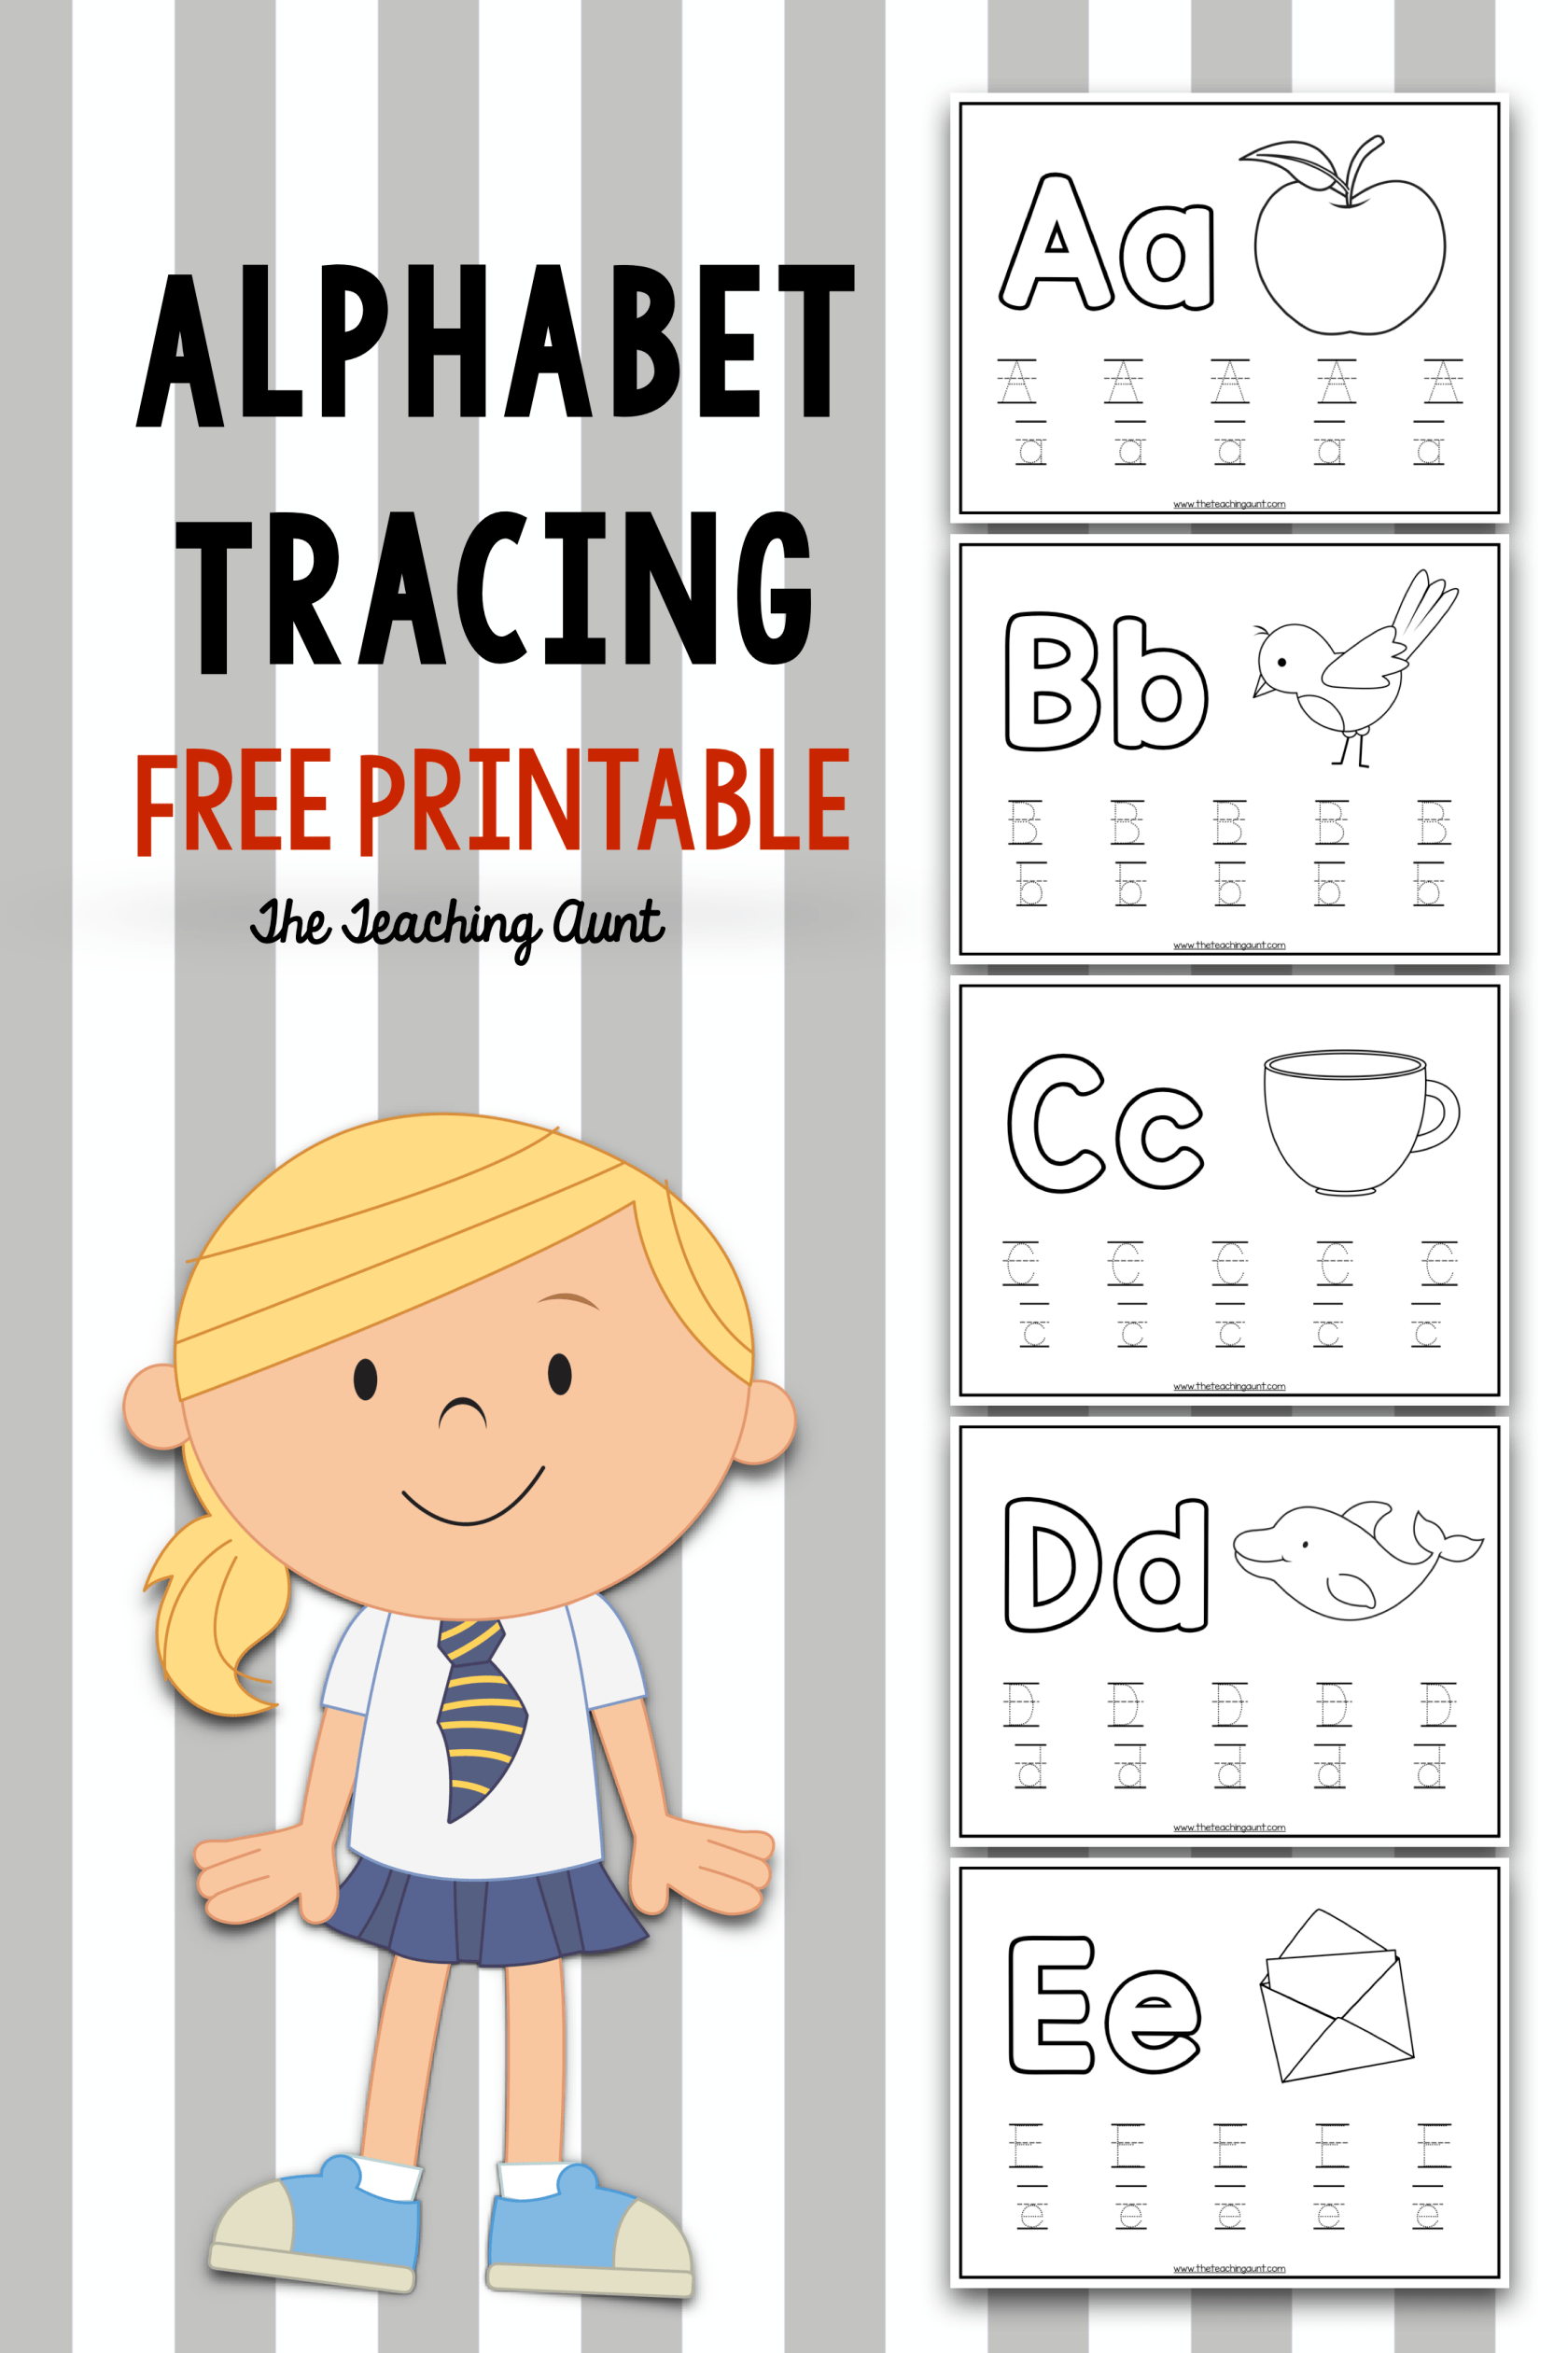 Alphabet Tracing Free Printable The Teaching Aunt Alphabet Activities Preschool Alphabet Preschool Alphabet Tracing [ 2521 x 1680 Pixel ]